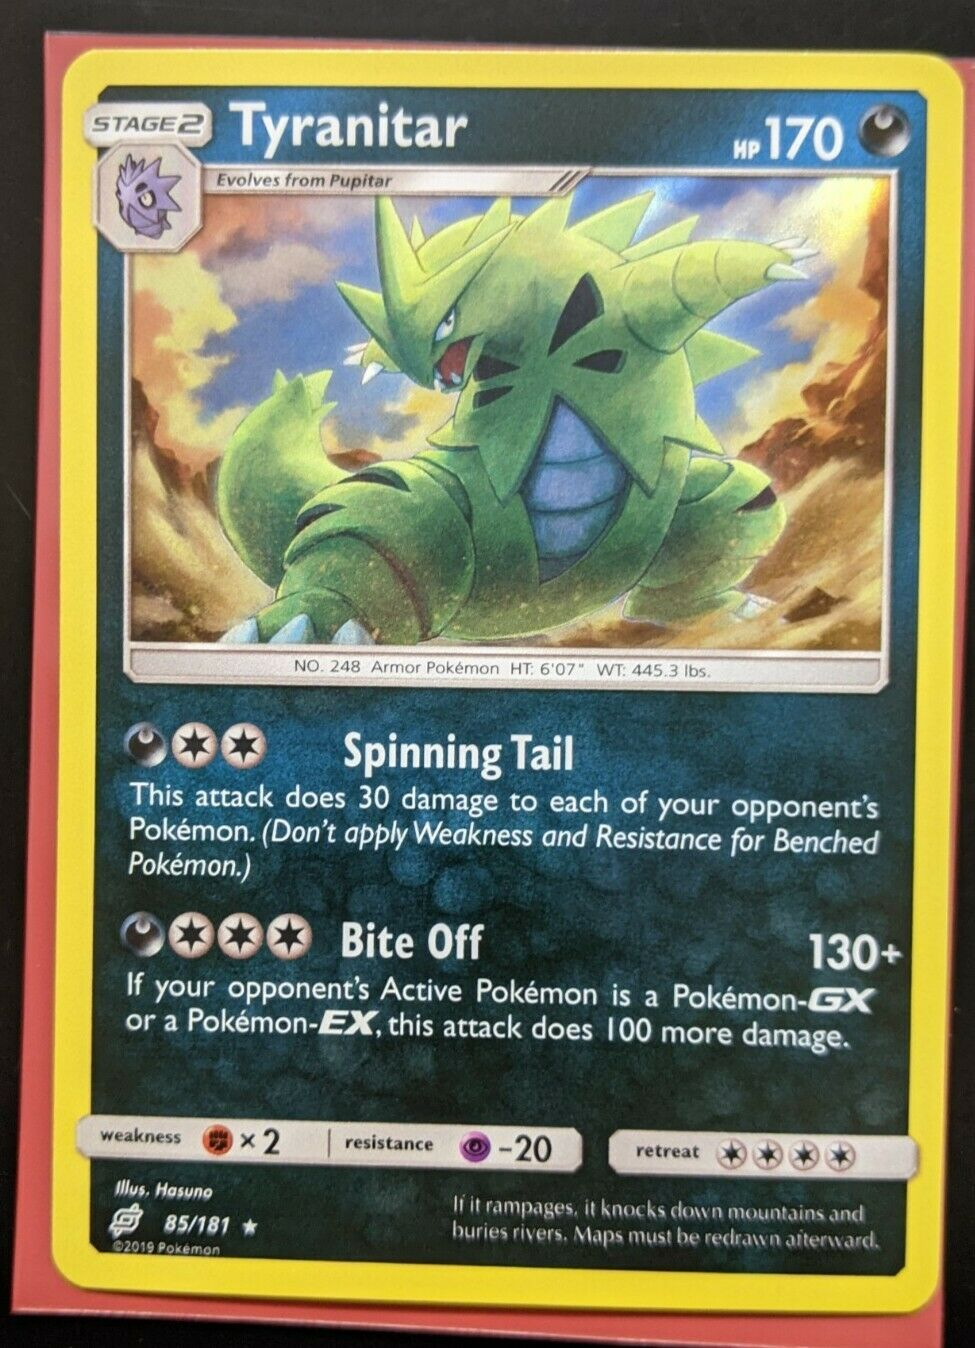 Pokemon Tcg SM Team hasta 85//181 Tyranitar Holográfica tarjeta rara